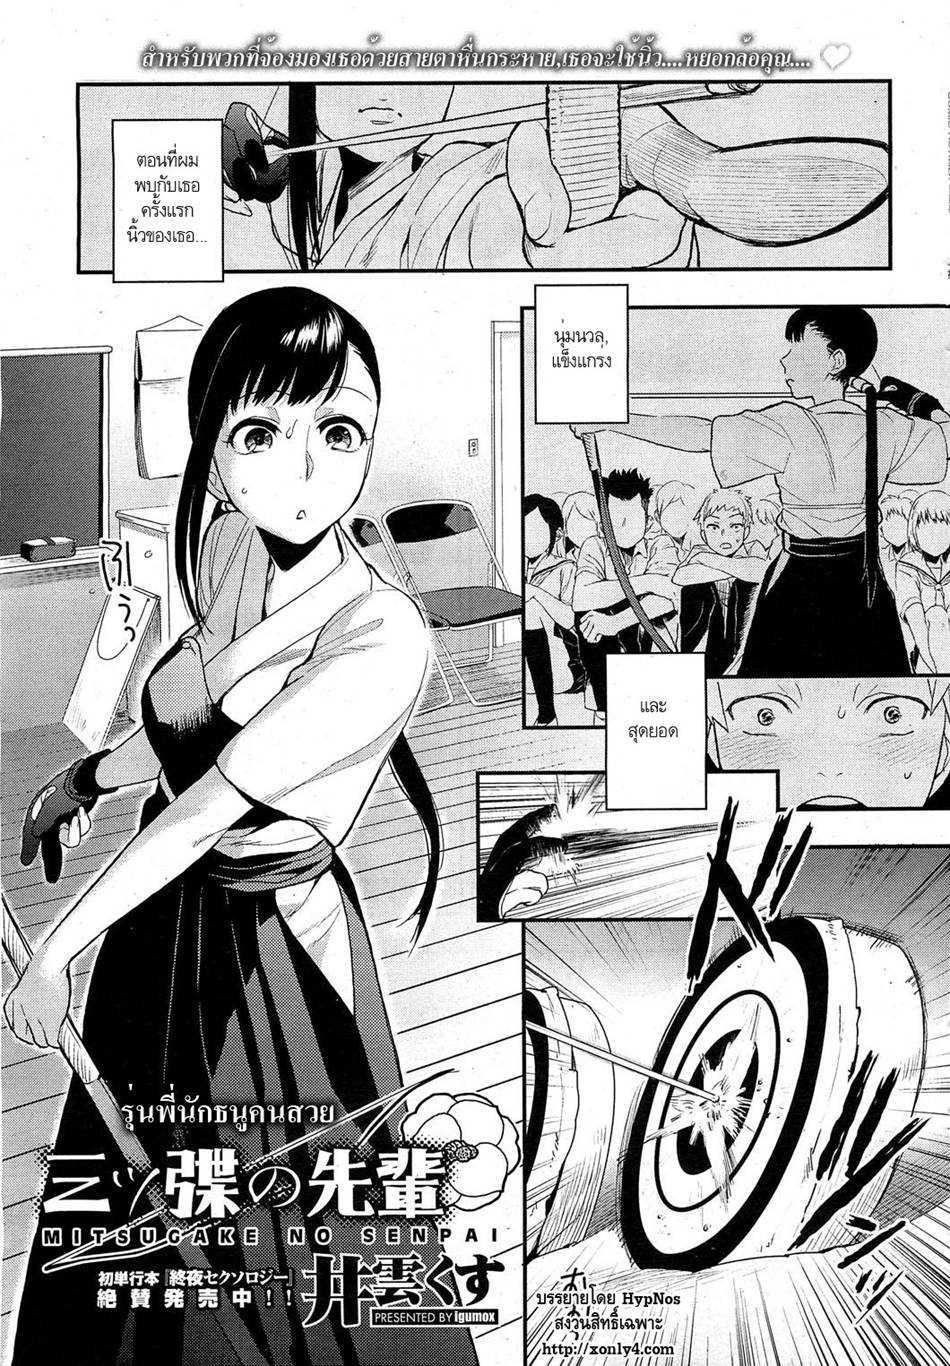 igumox-mitsugake-no-senpai-senpais-sweet-archery-glove-comic-hotmilk-2012-09